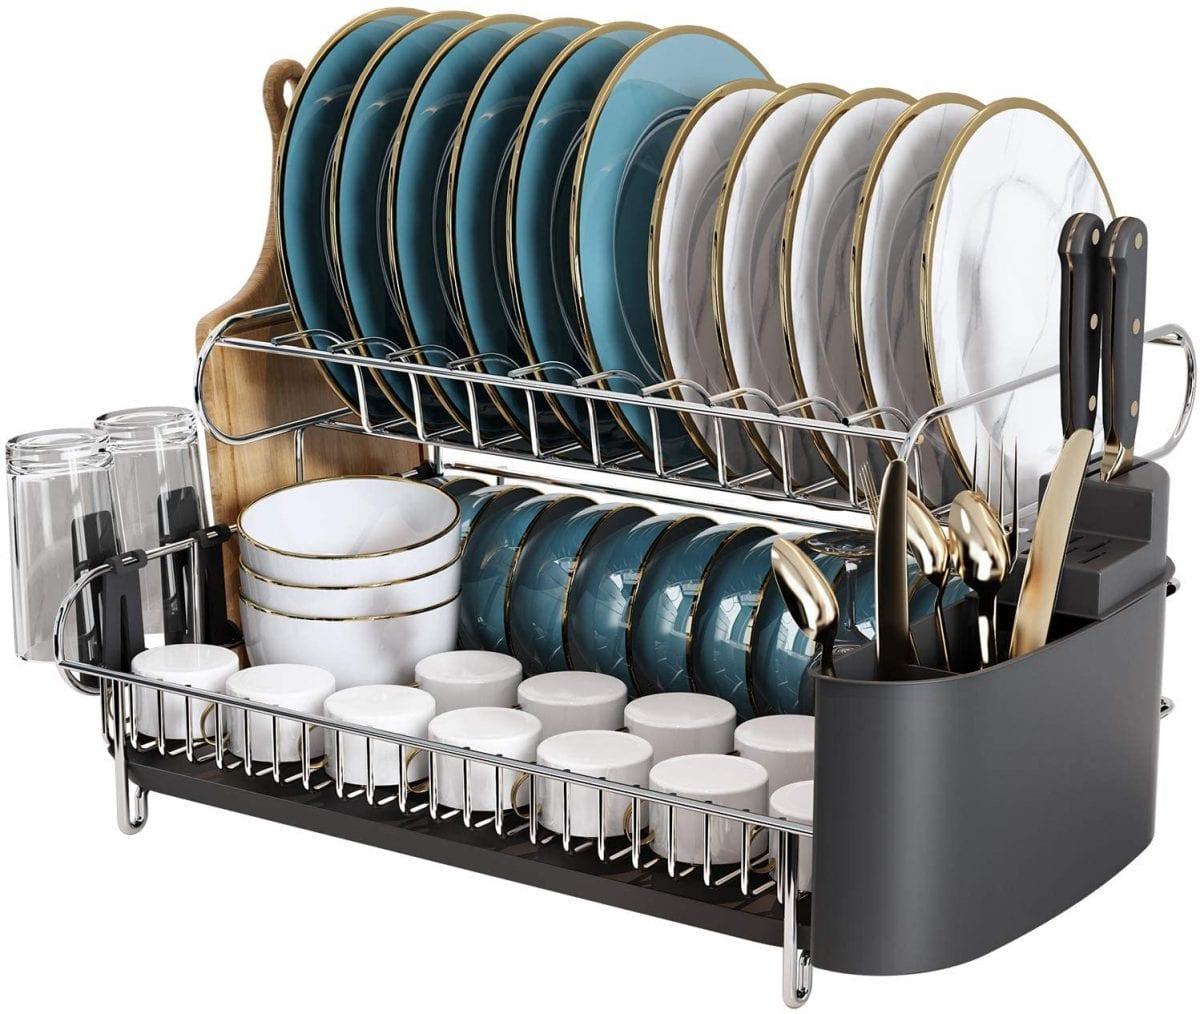 Boosiny 2-tier dish rack